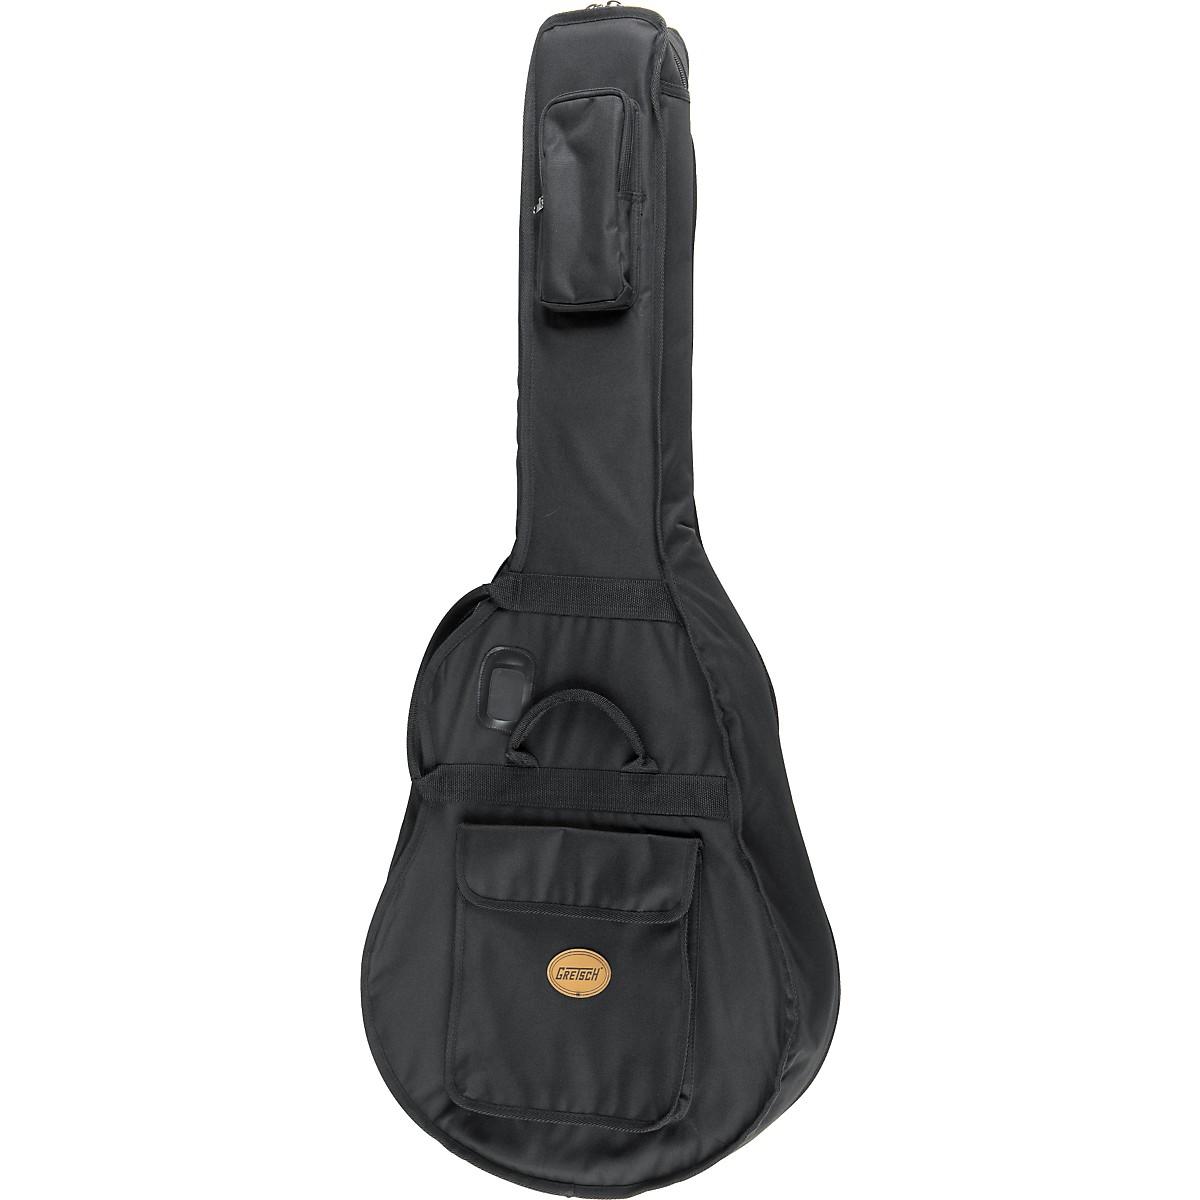 Gretsch Guitars Electromatic G2162 Gig Bag